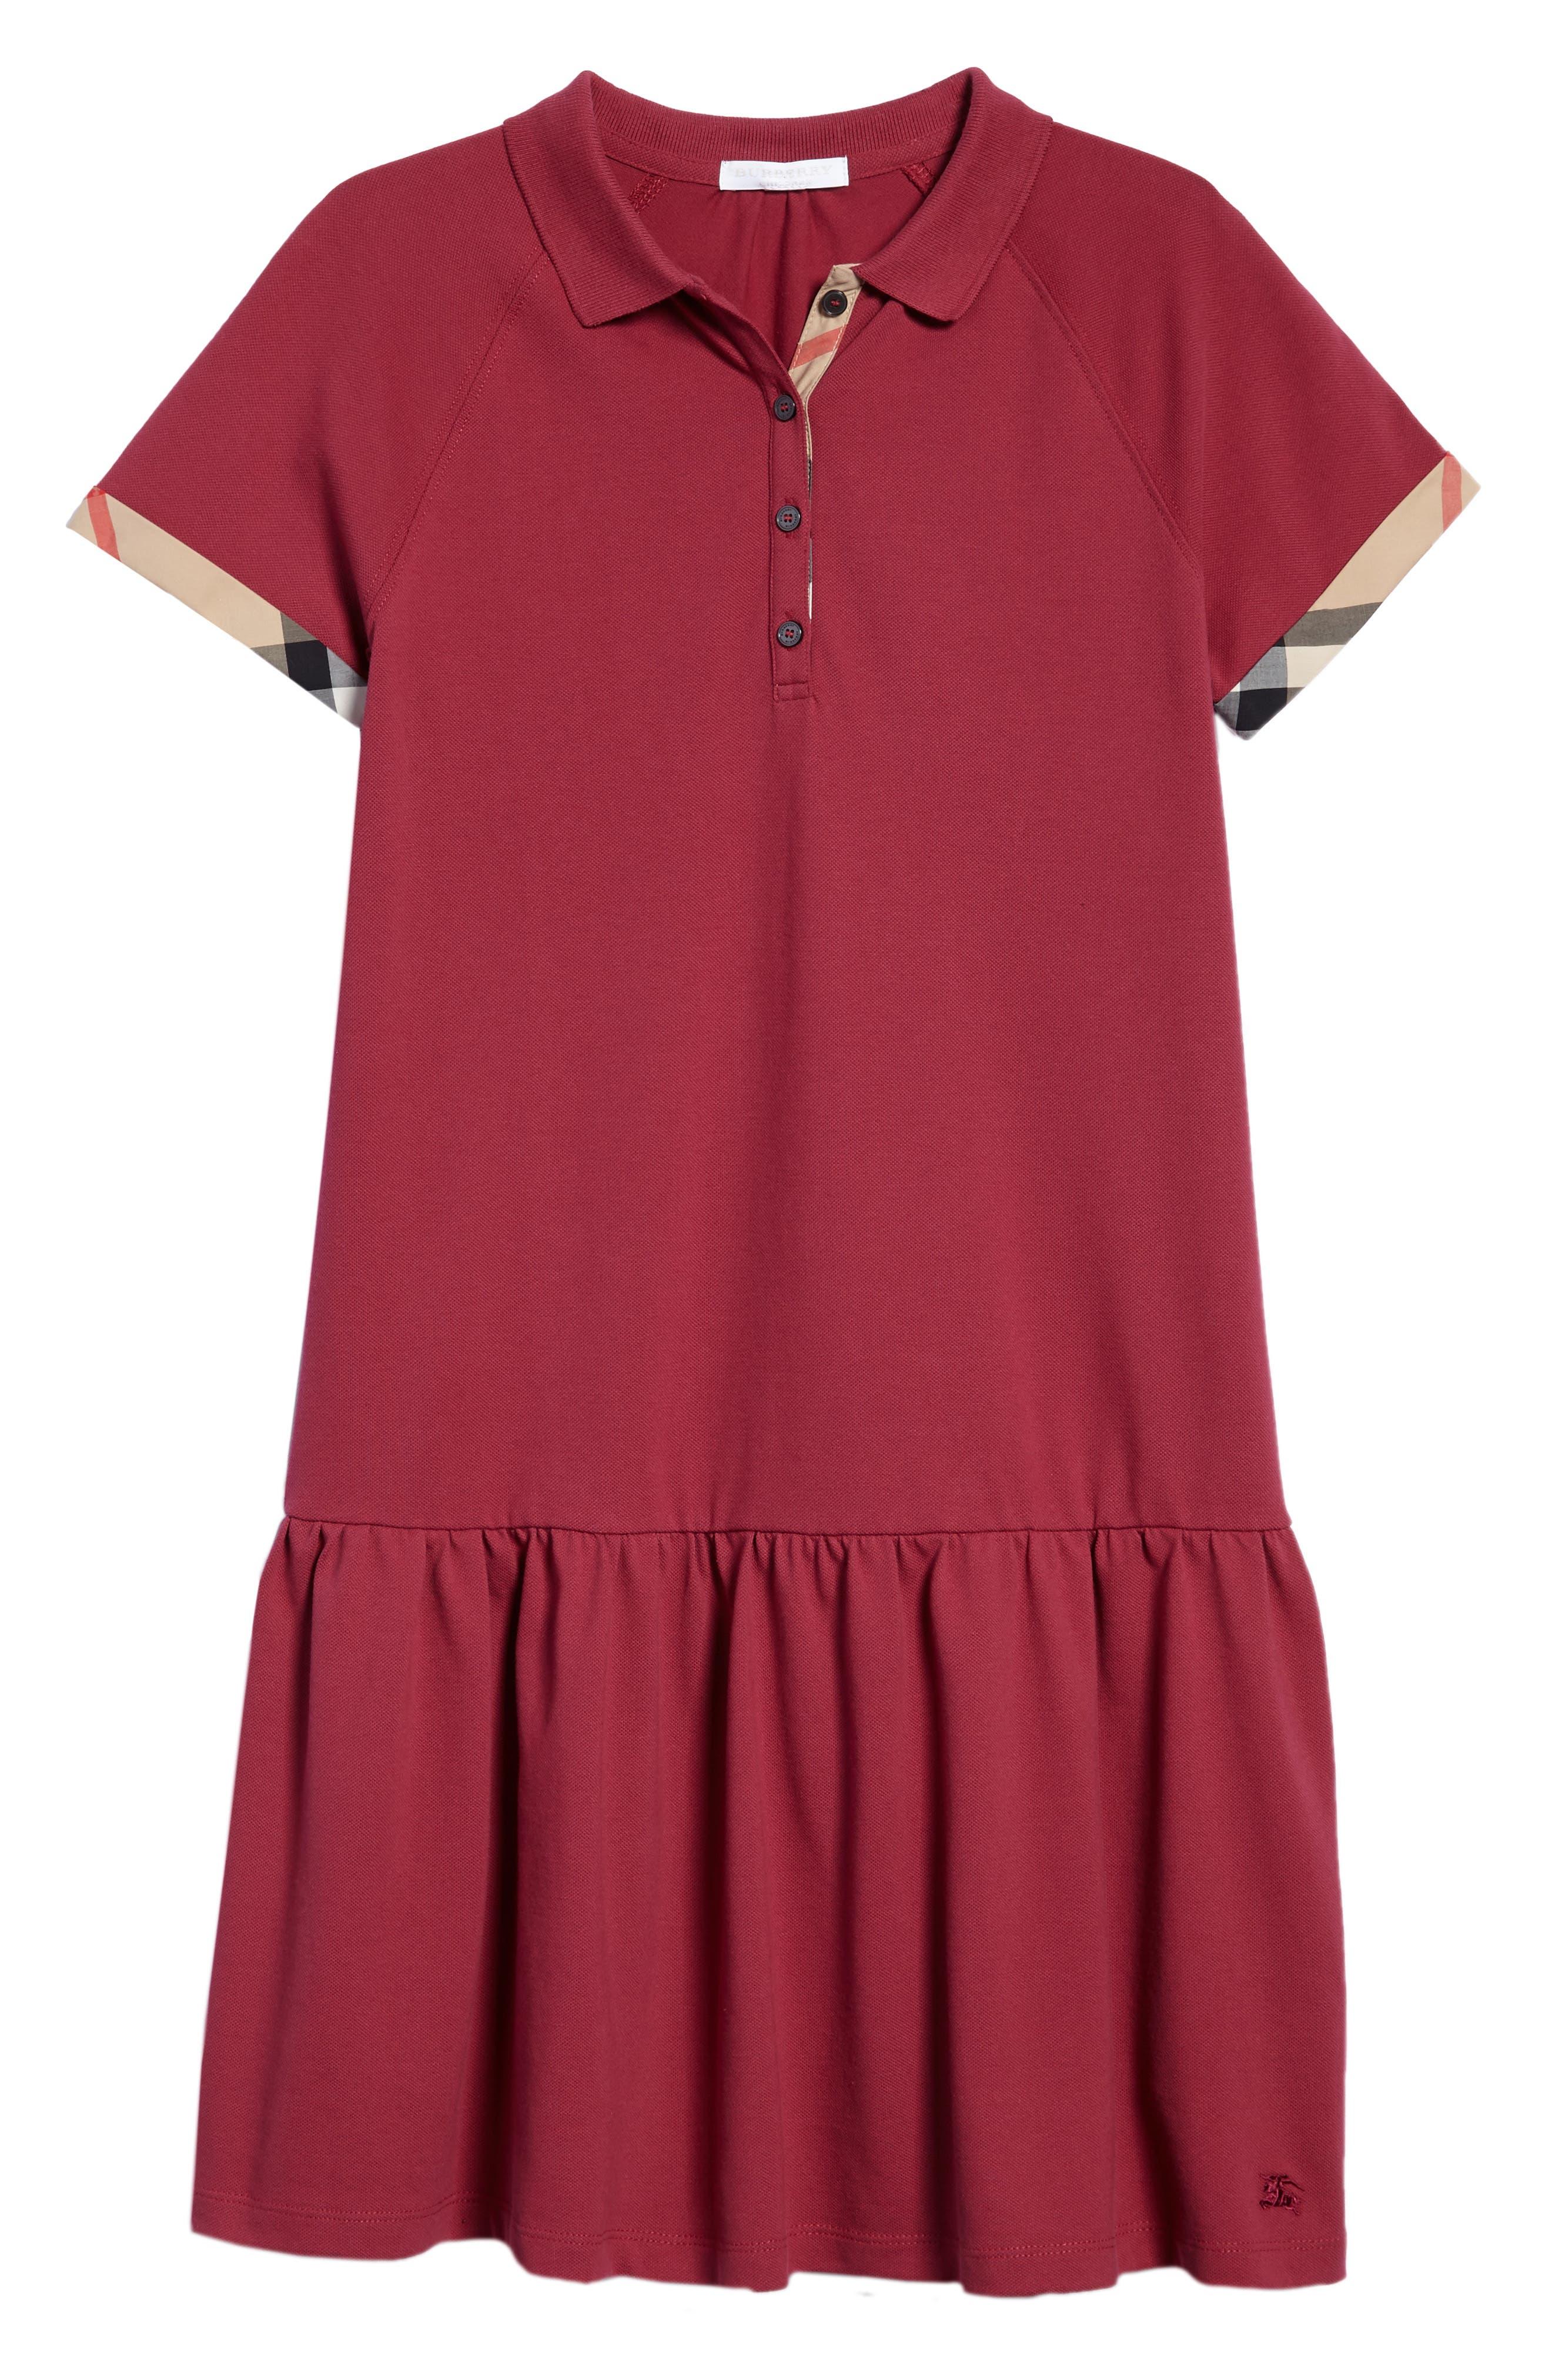 Main Image - Burberry Cali Polo Dress (Little Girls & Big Girls)